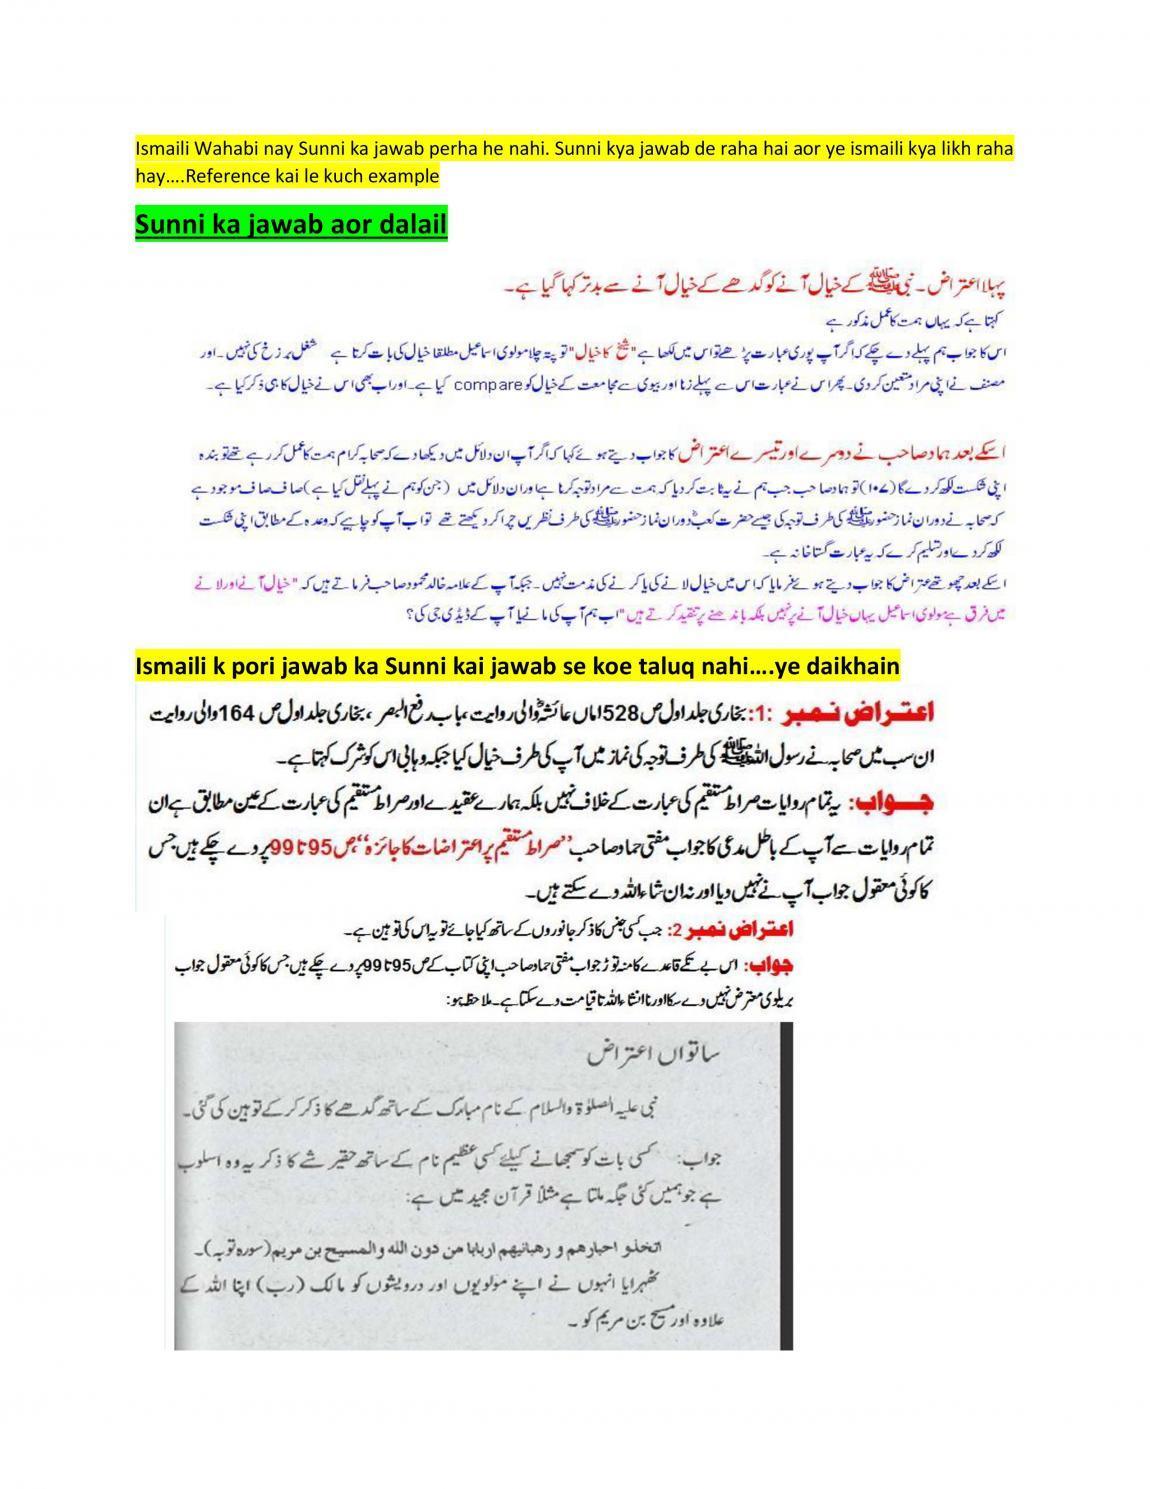 Ismaili Wahabi nay Sunni ka jawab perha he nahi-page-0.jpg